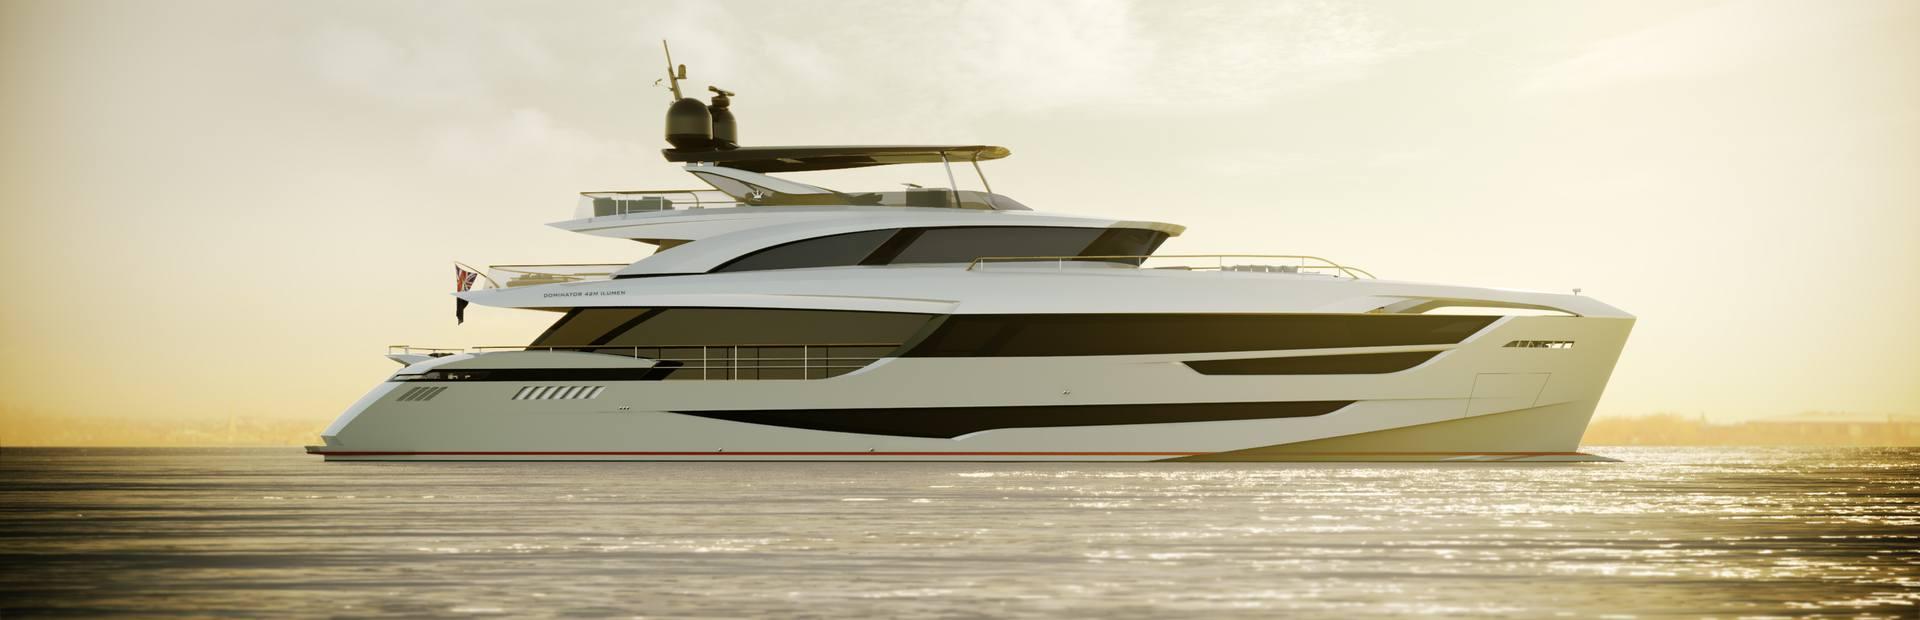 Dominator 42M Ilumen FD Yacht Charter